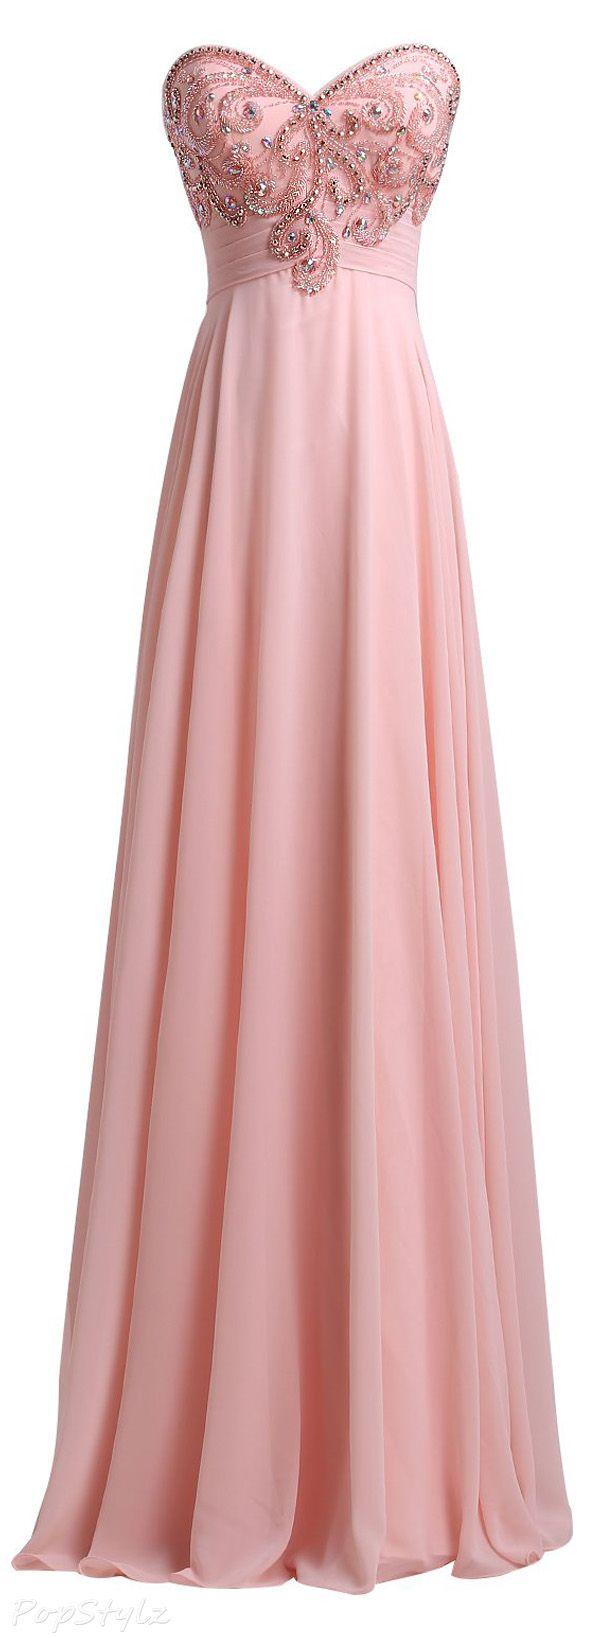 SeasonMall Chiffon A Line Sweetheart Evening Dress